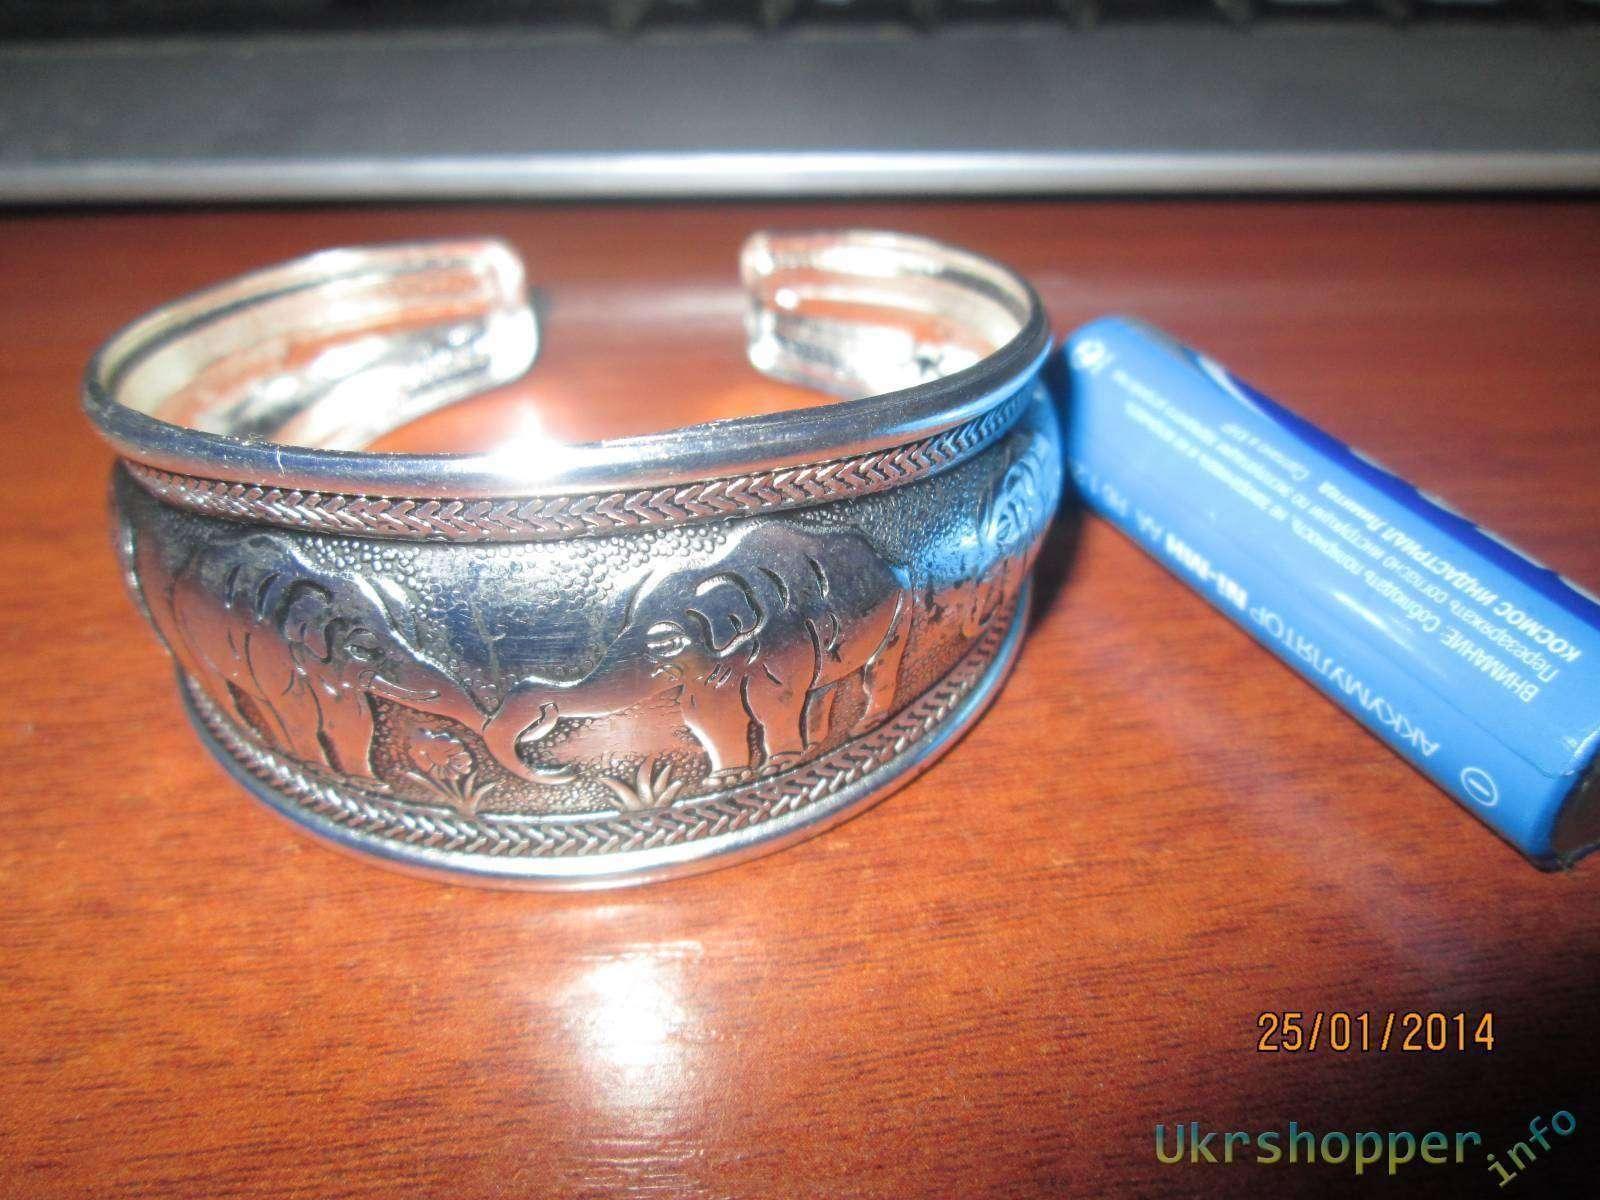 Ebay: Цацка с замахом на Тибетский фетиш или бижутерия глазами мужчины